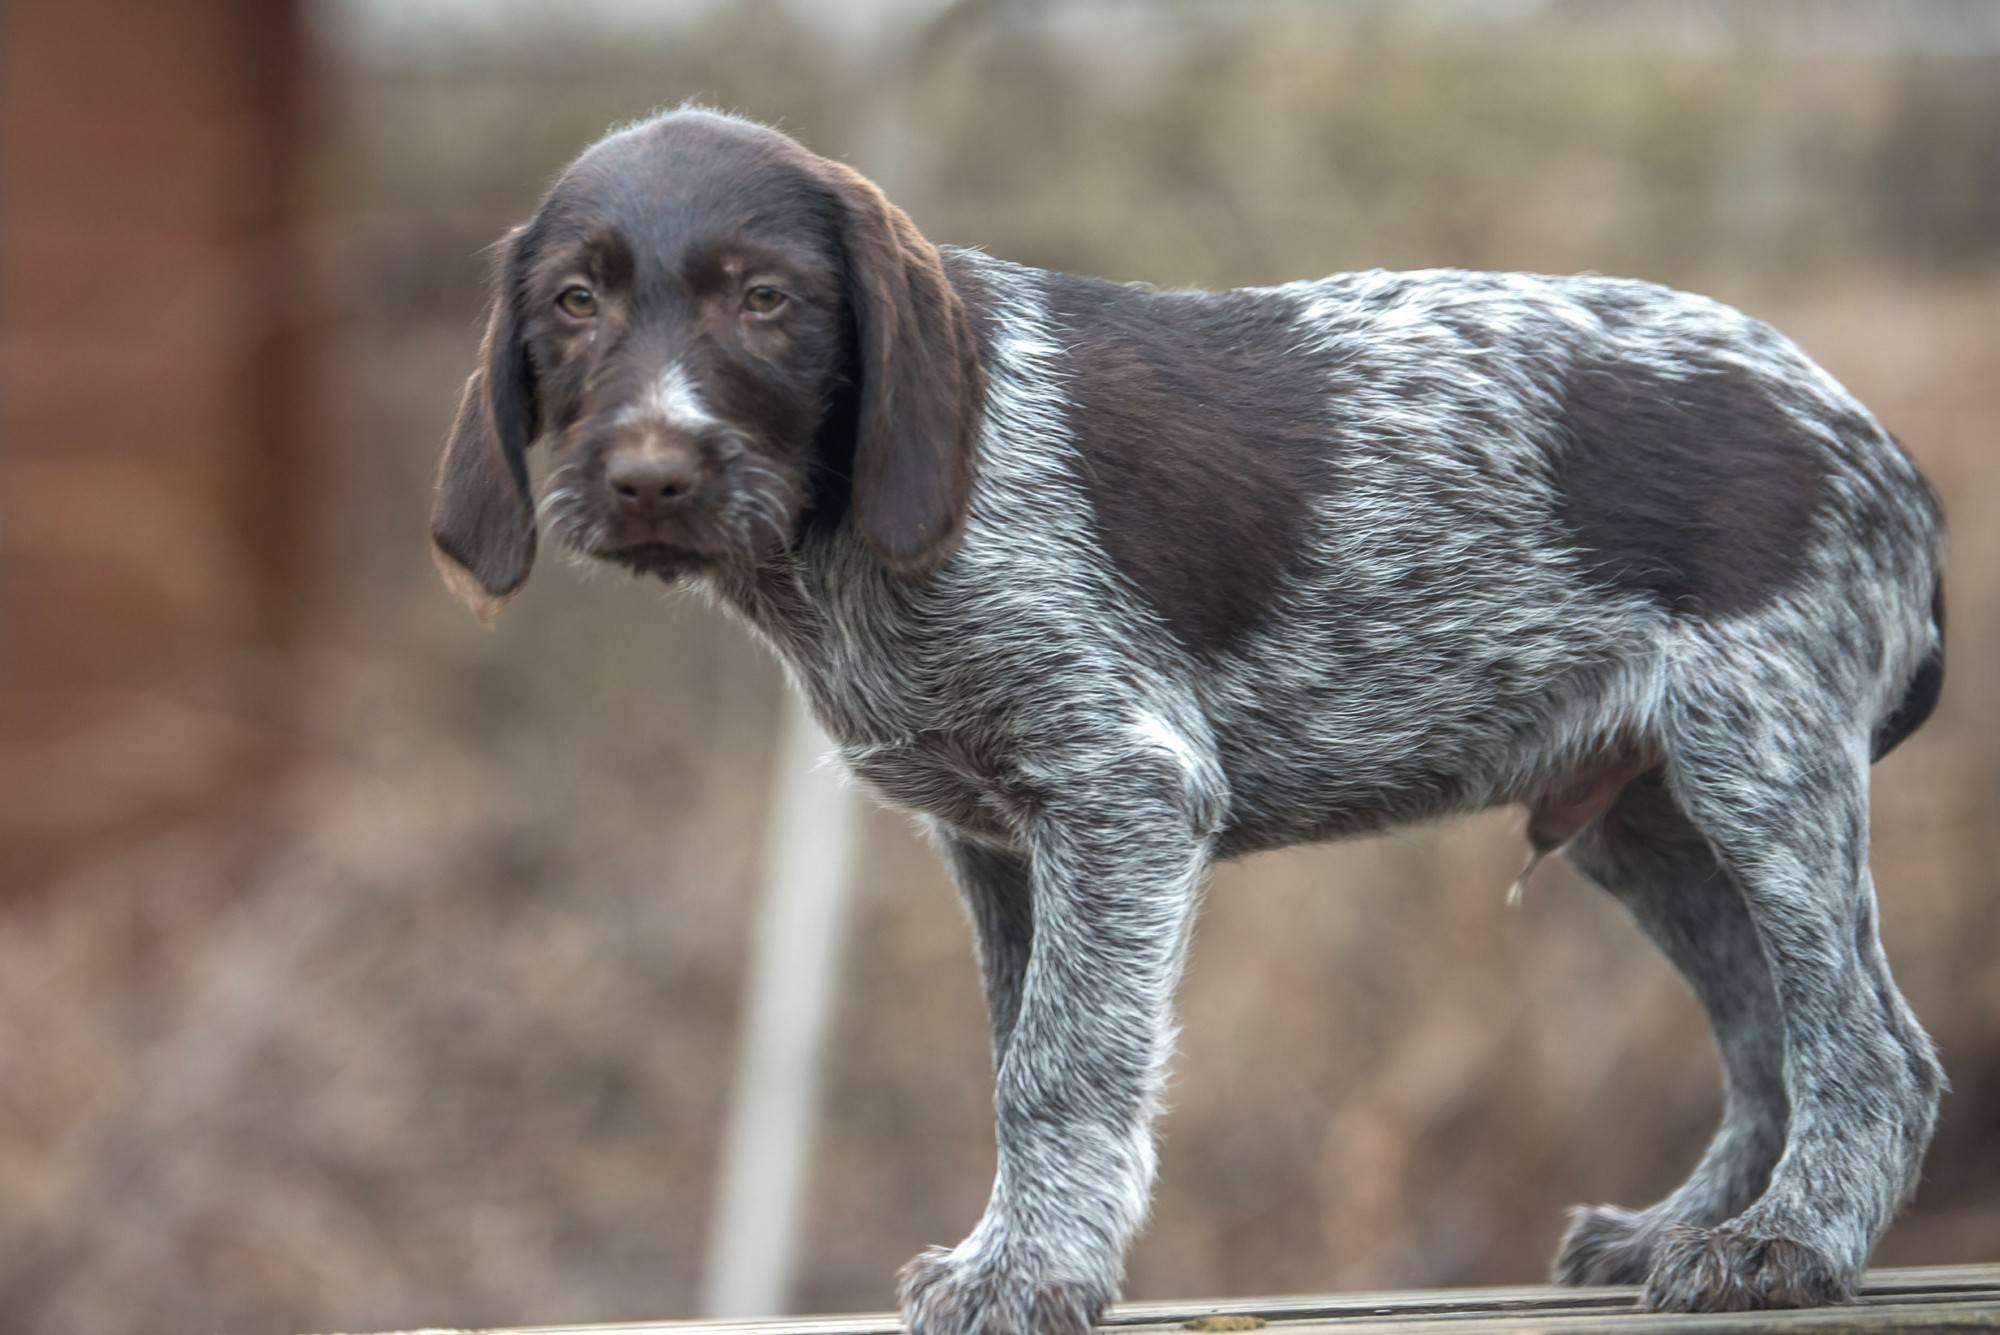 Курцхаар: все о собаке, фото, описание породы, характер, цена